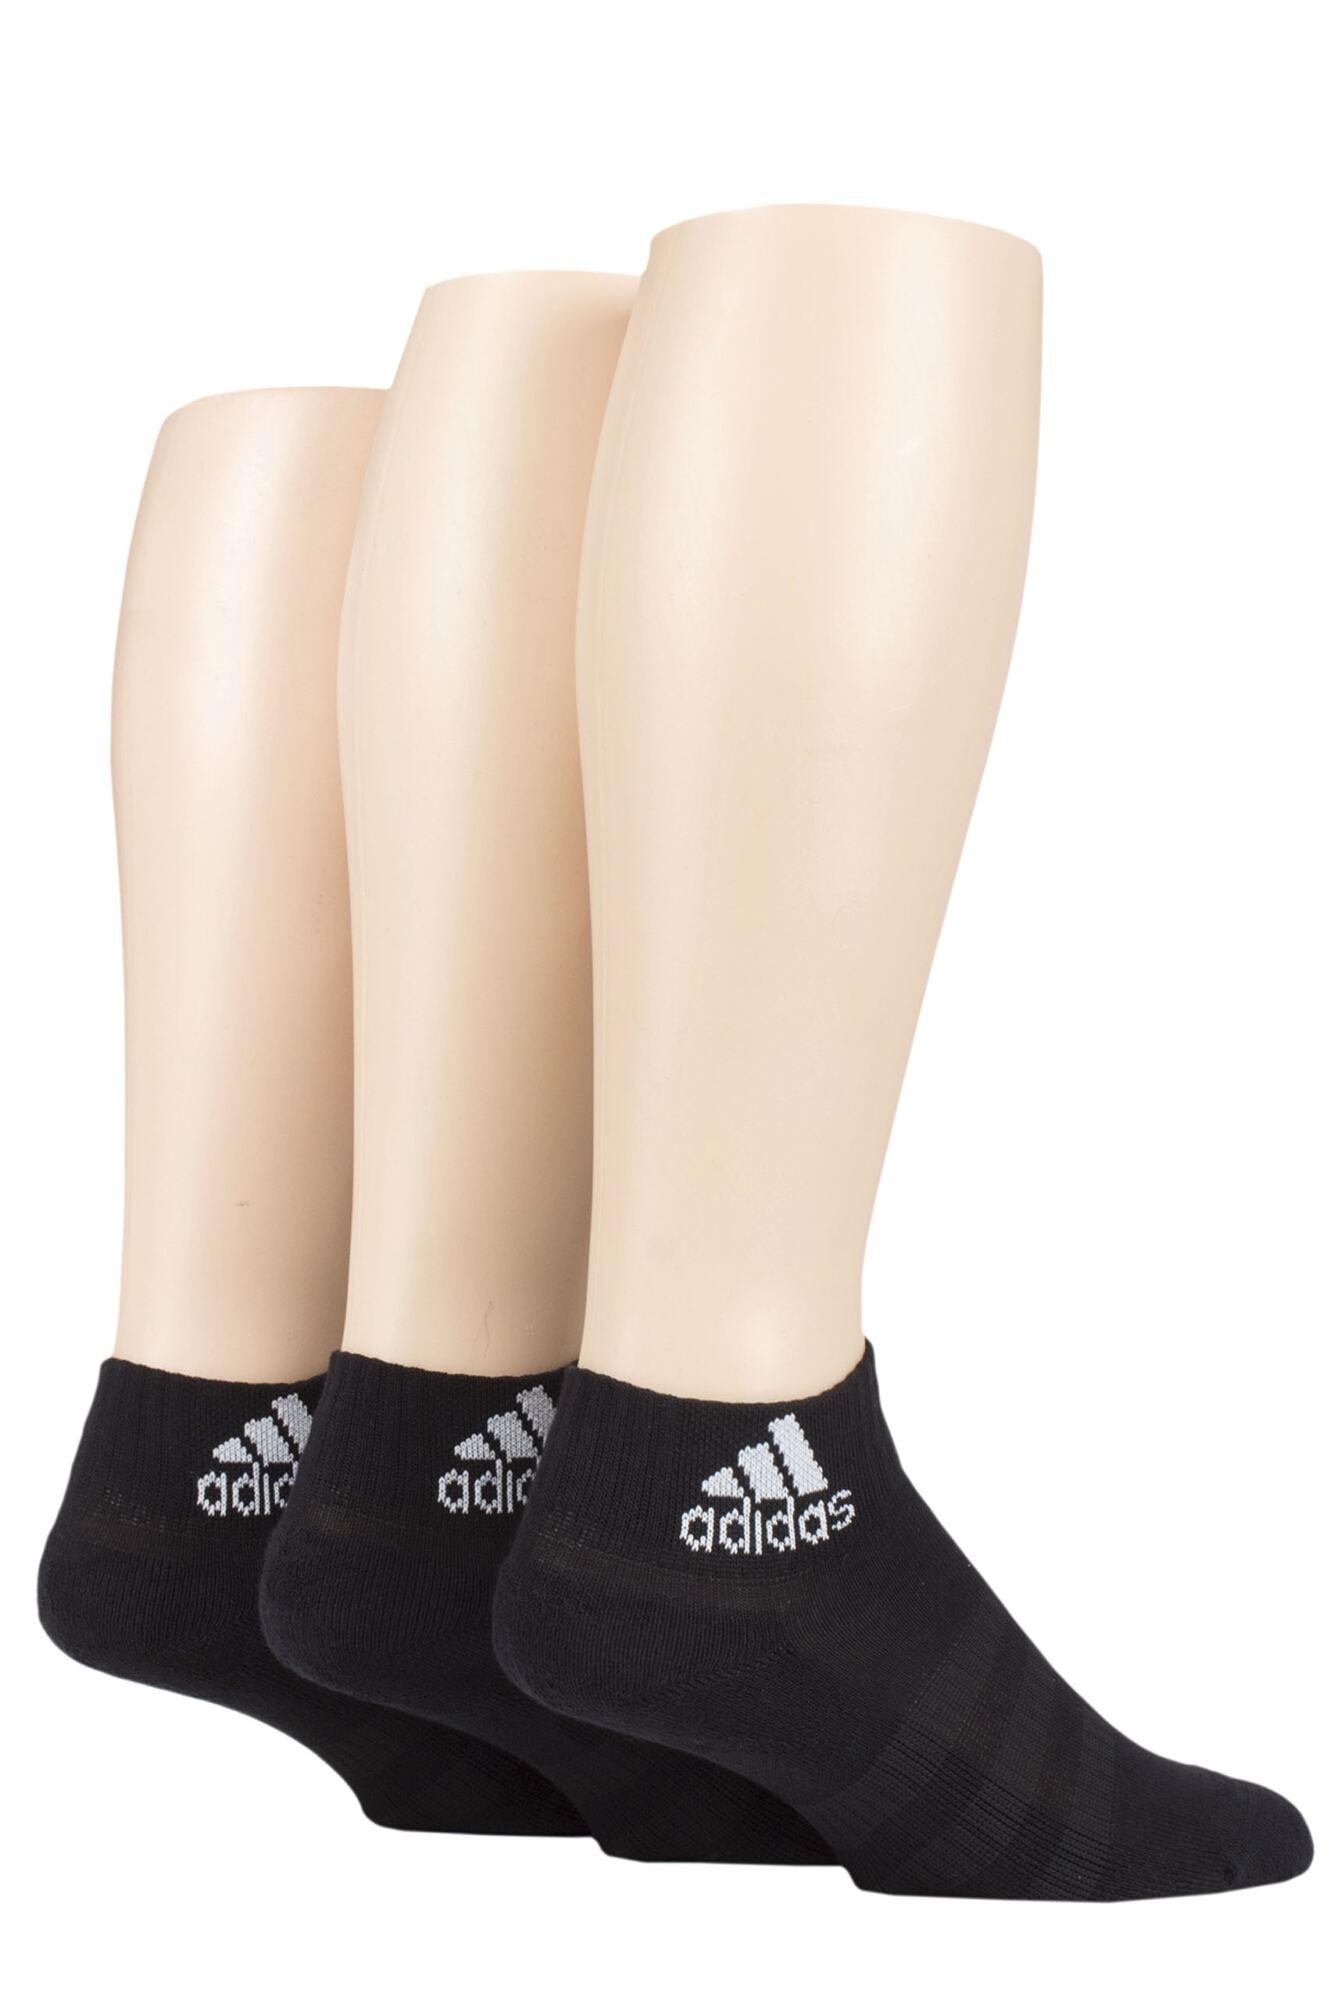 Adidas 3 Pair Cushioned Ankle Socks